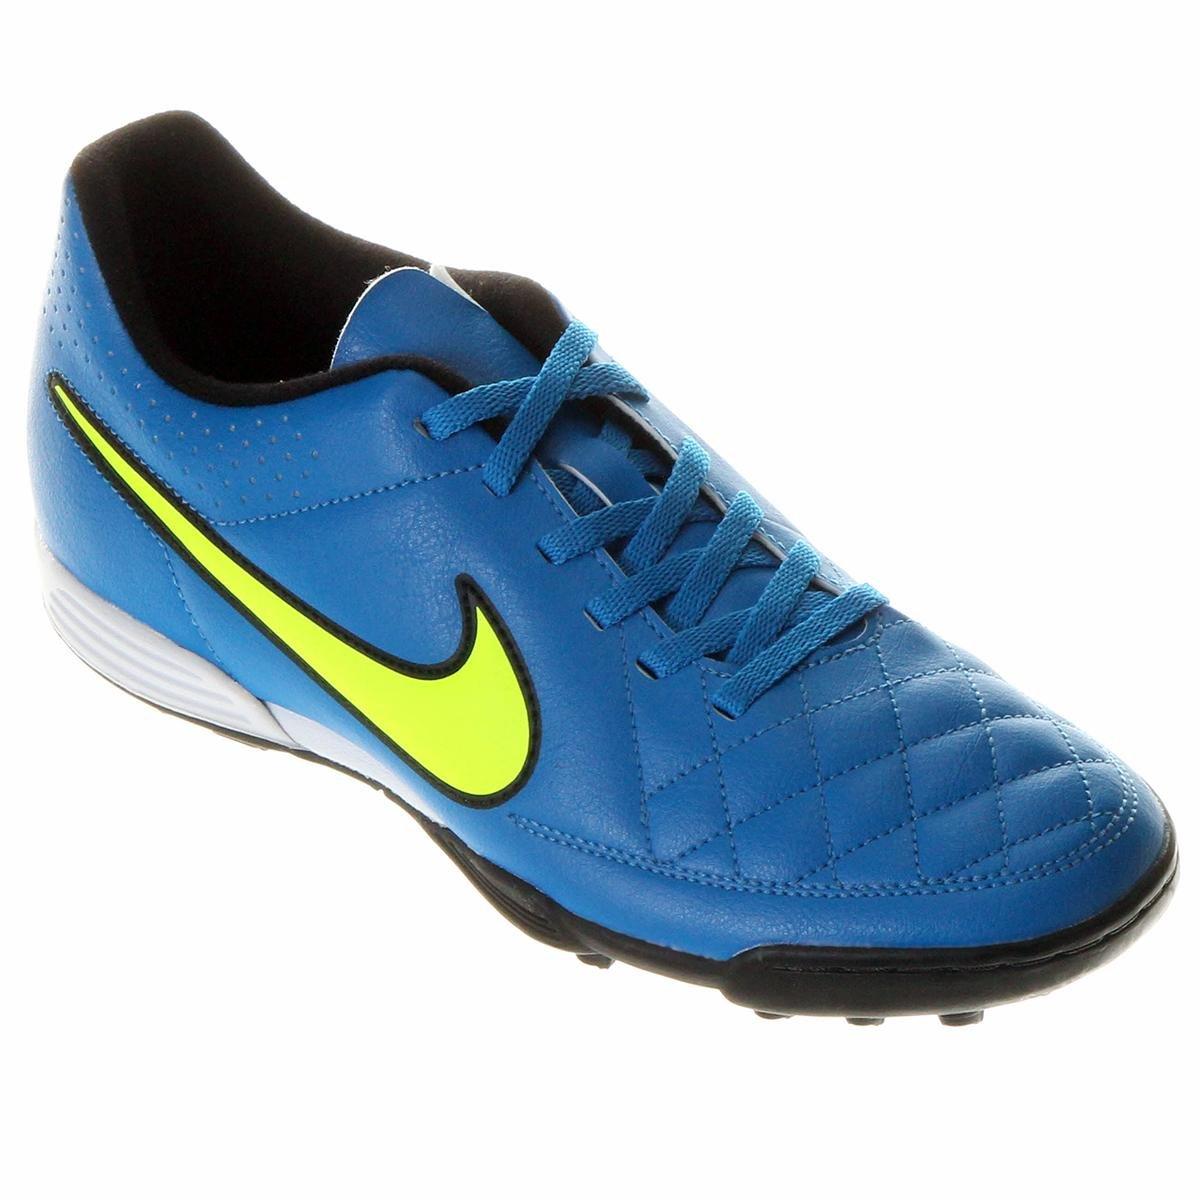 adb3b9c5d1 Chuteira Nike Tiempo Rio 2 TF Society - Compre Agora